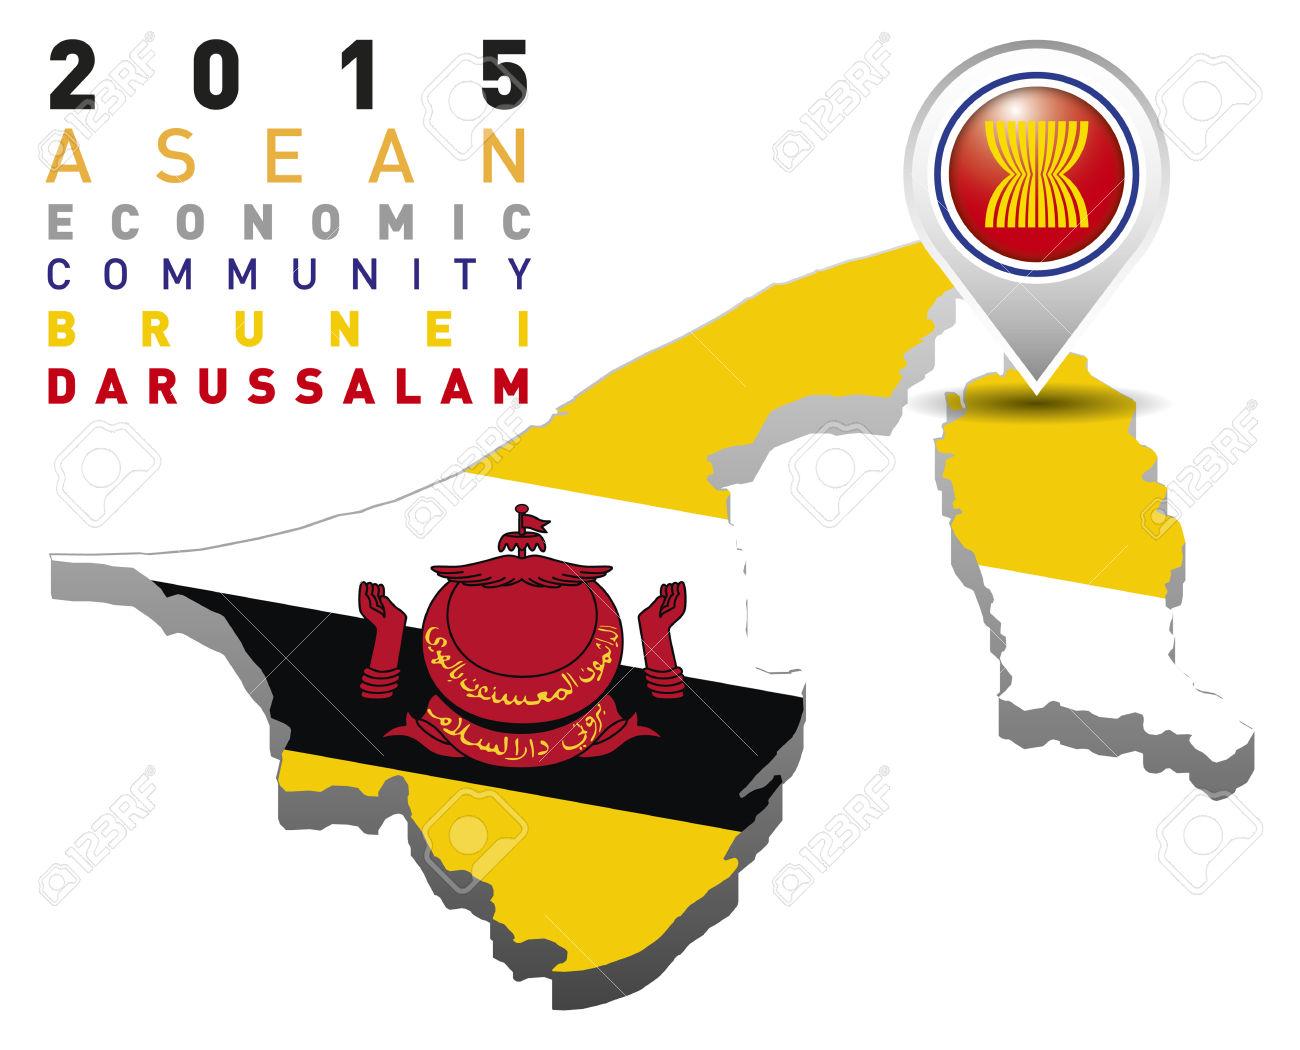 2015 Asean Economic Community Brunei Darussalam Royalty Free.